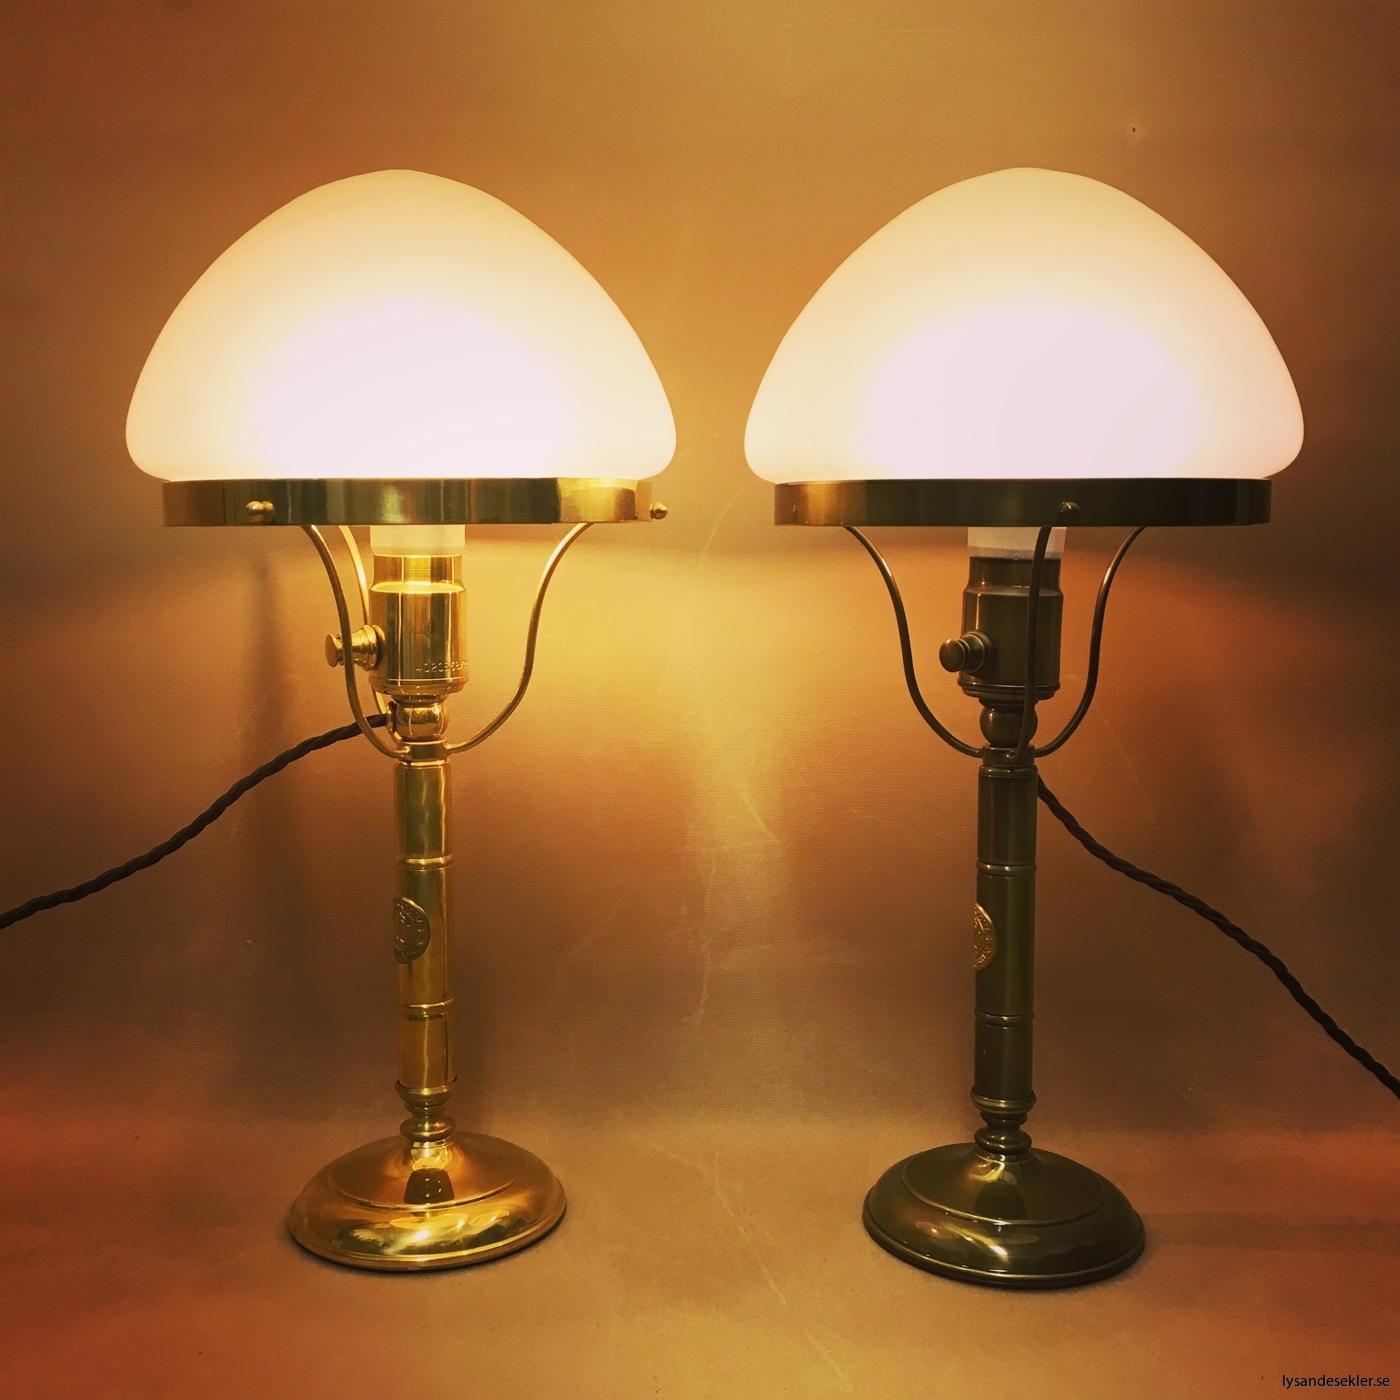 strindbergslampa frostad optikmatterad toppig skärm